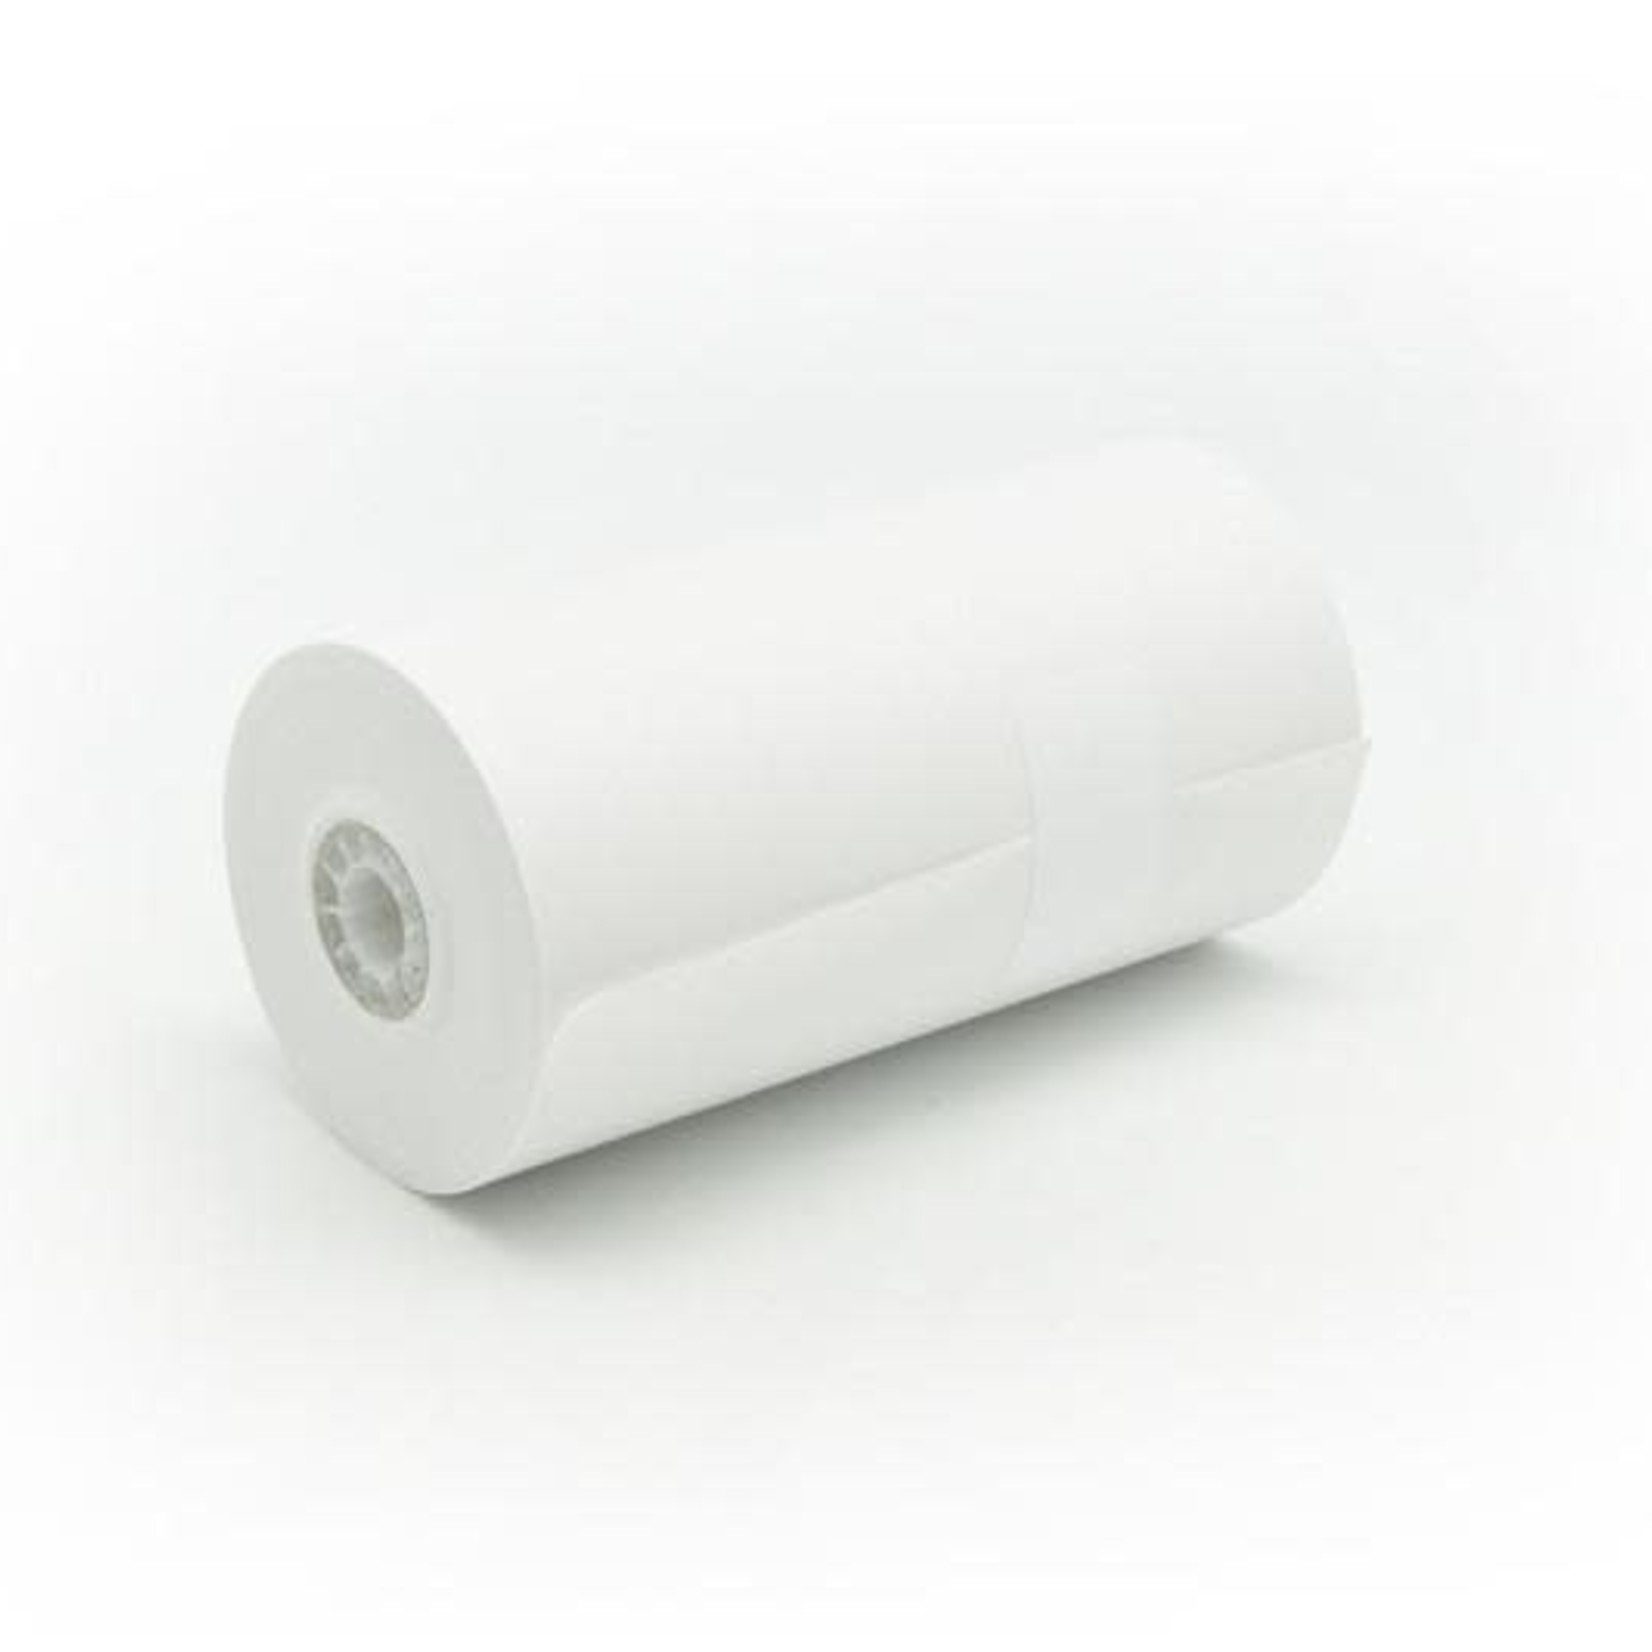 Batle Studio Batle - Roll Paper Refill